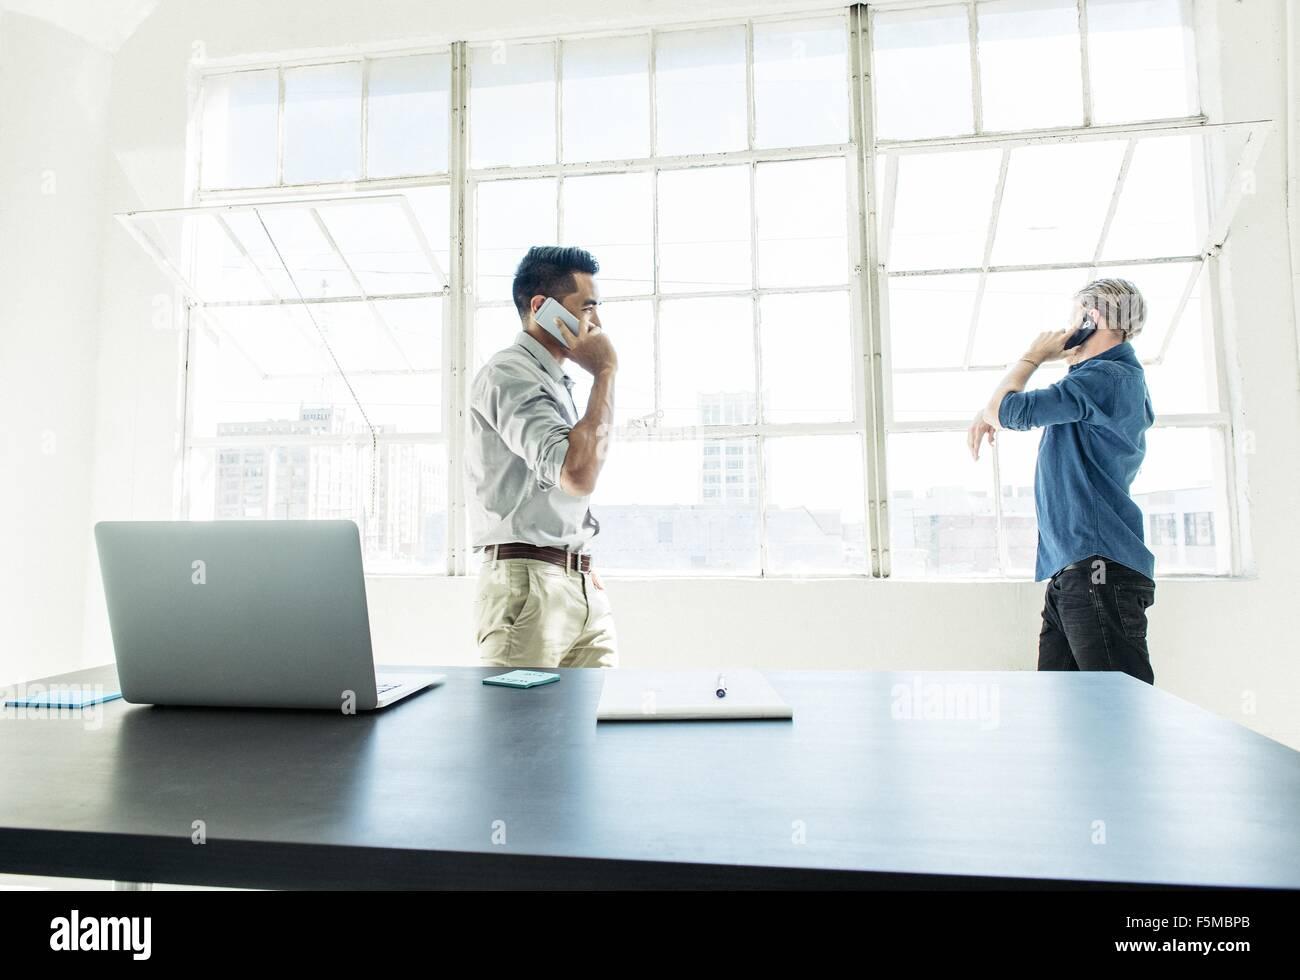 Businessmen speaking on smartphone by office window - Stock Image